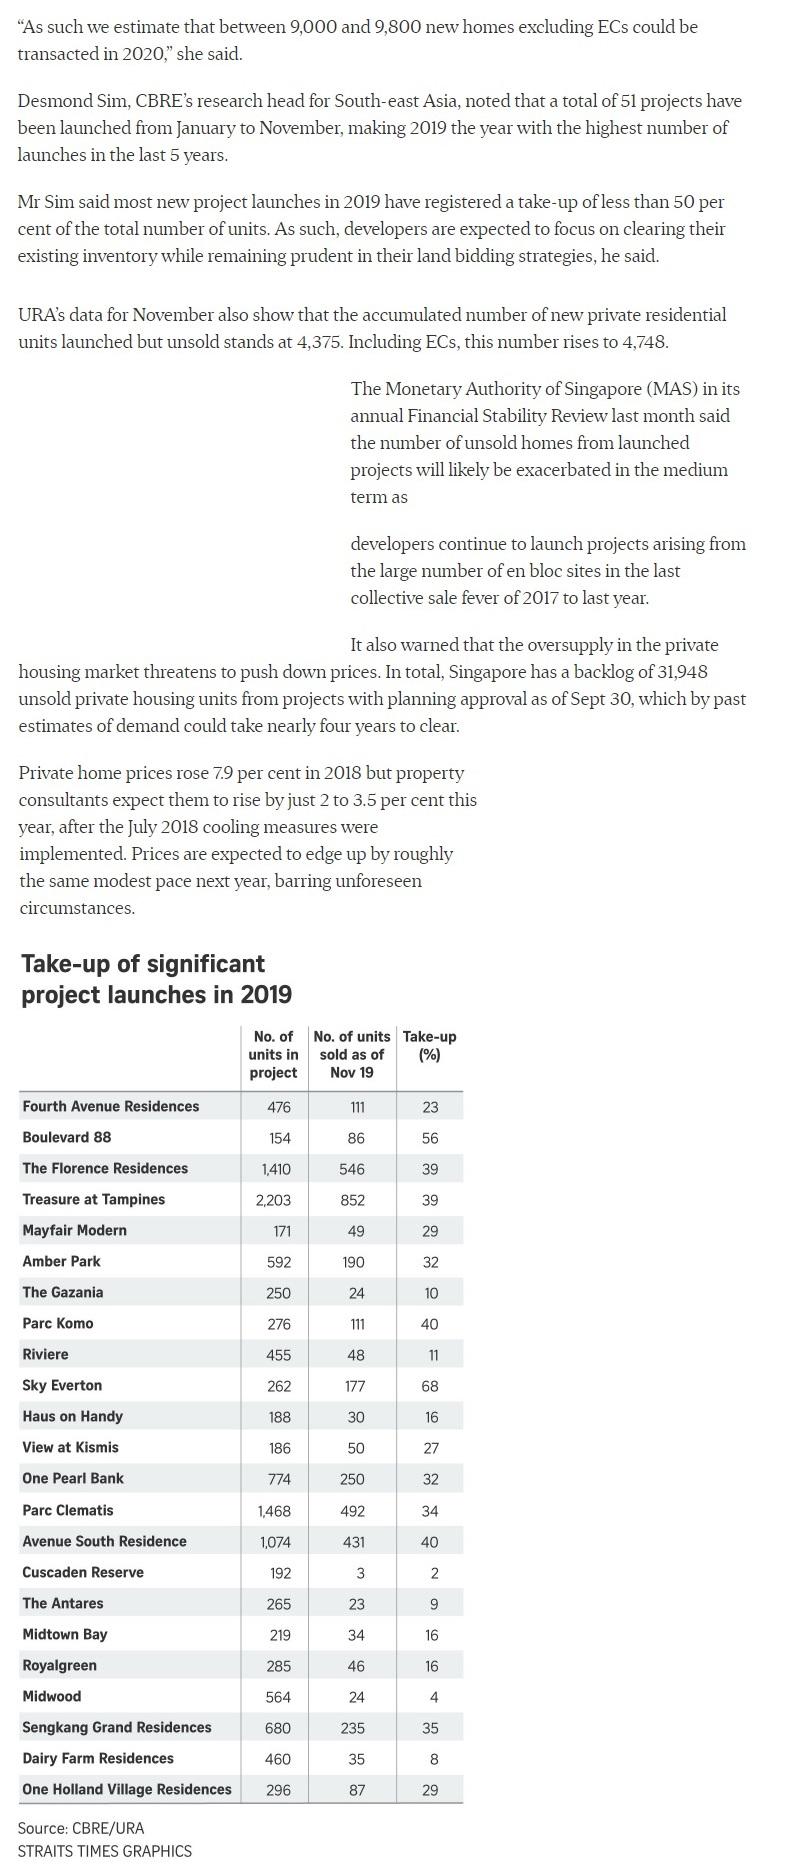 Ki Residences - New Private Home Sales Rebounded In November Amid Supply Glut : URA Data Part 2